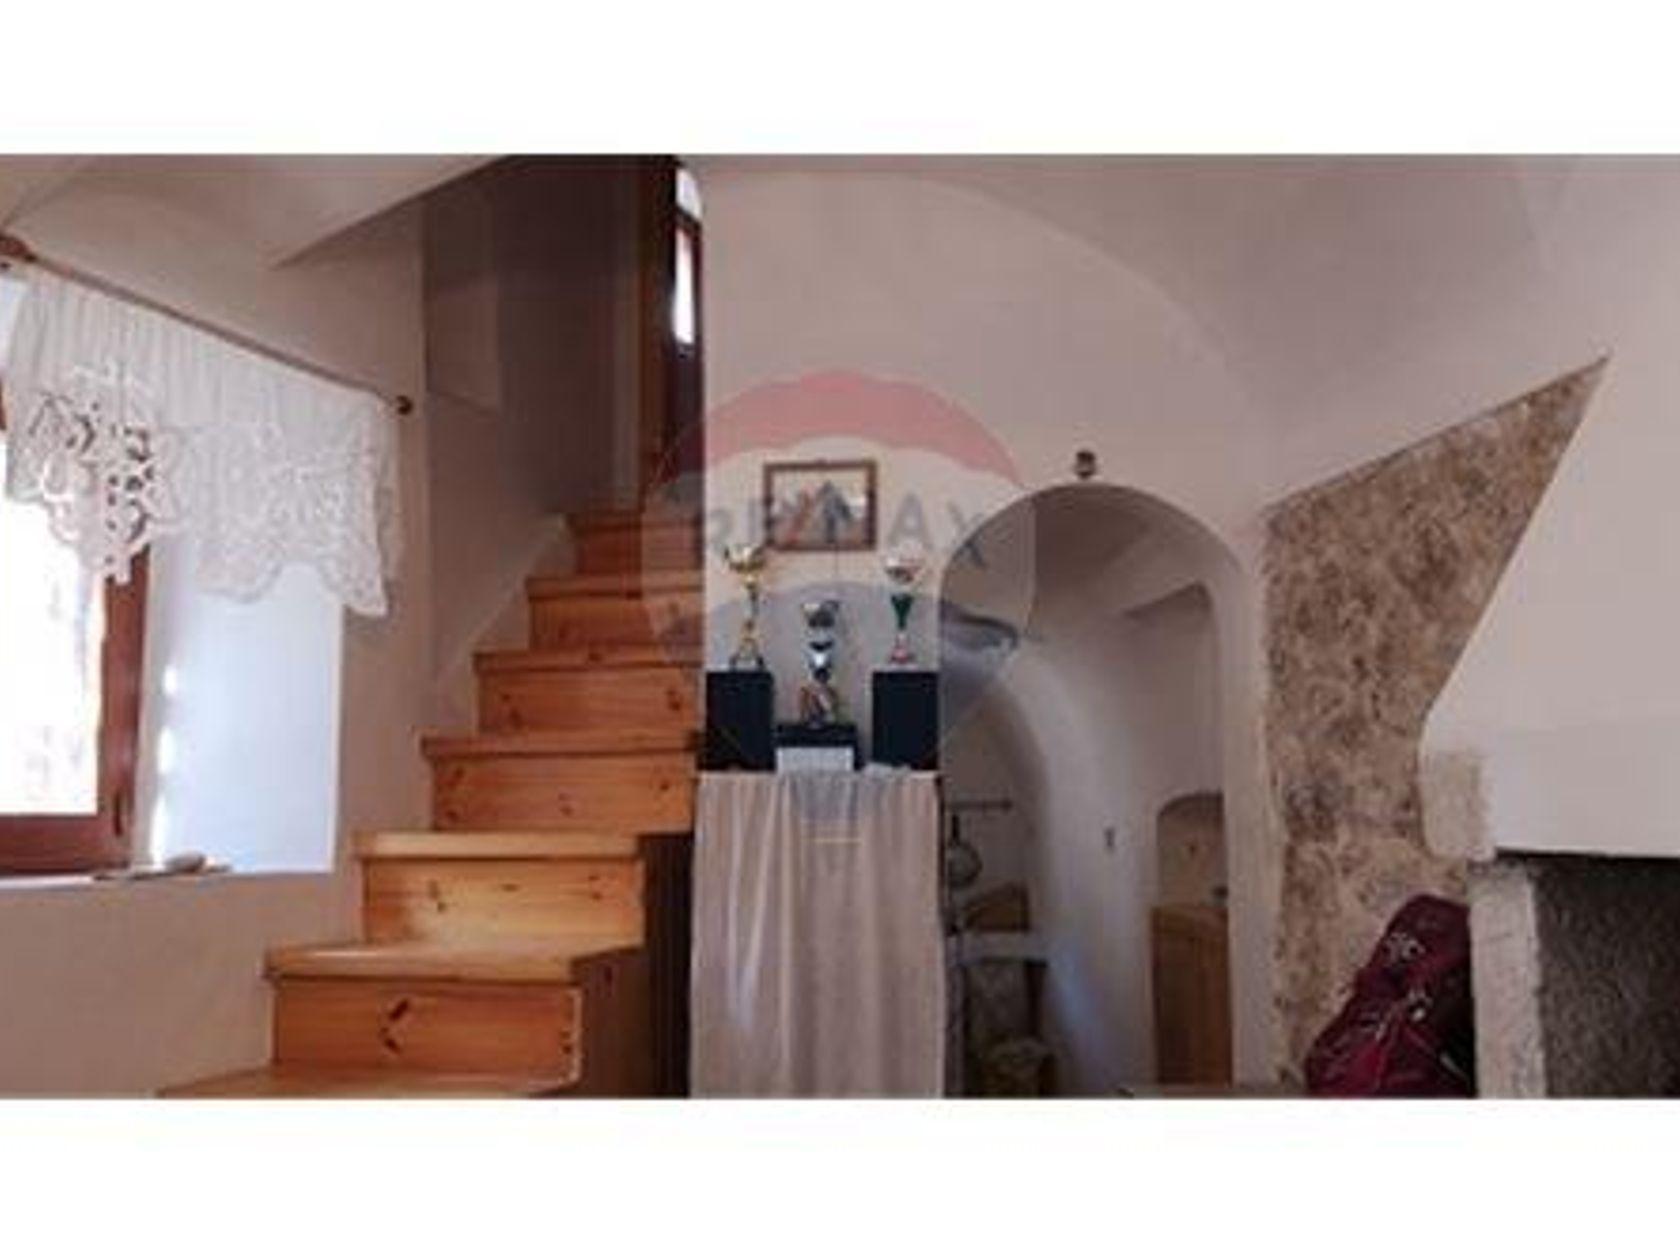 Appartamento Villetta Barrea, AQ Vendita - Foto 17